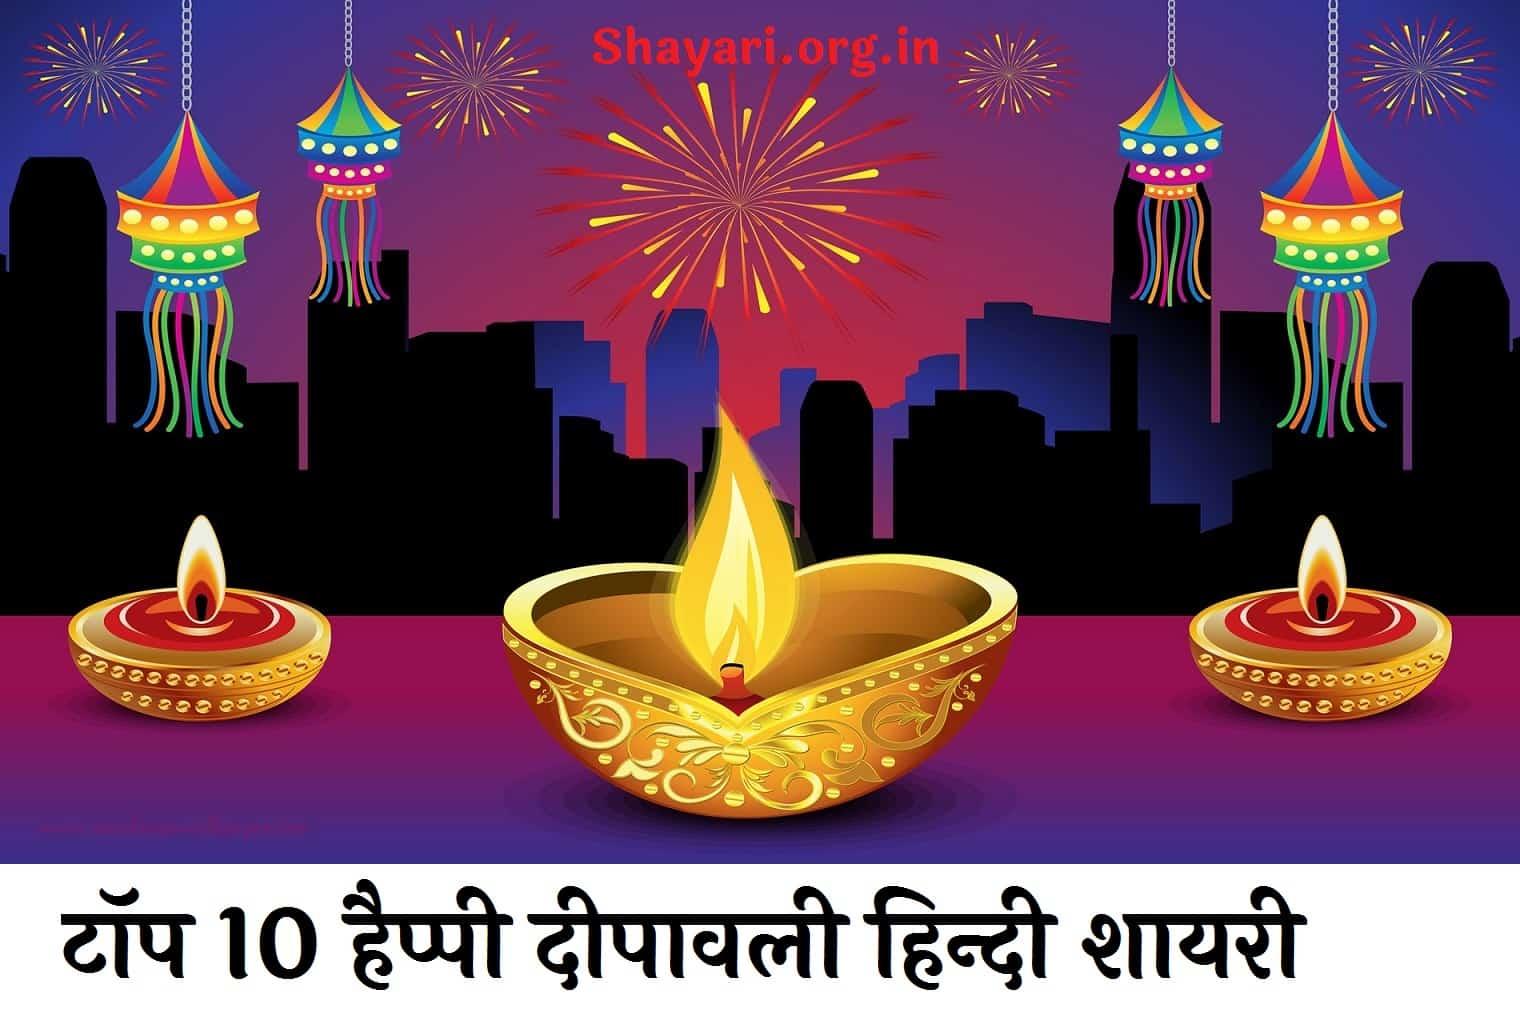 Happy Diwali Shayari SMS